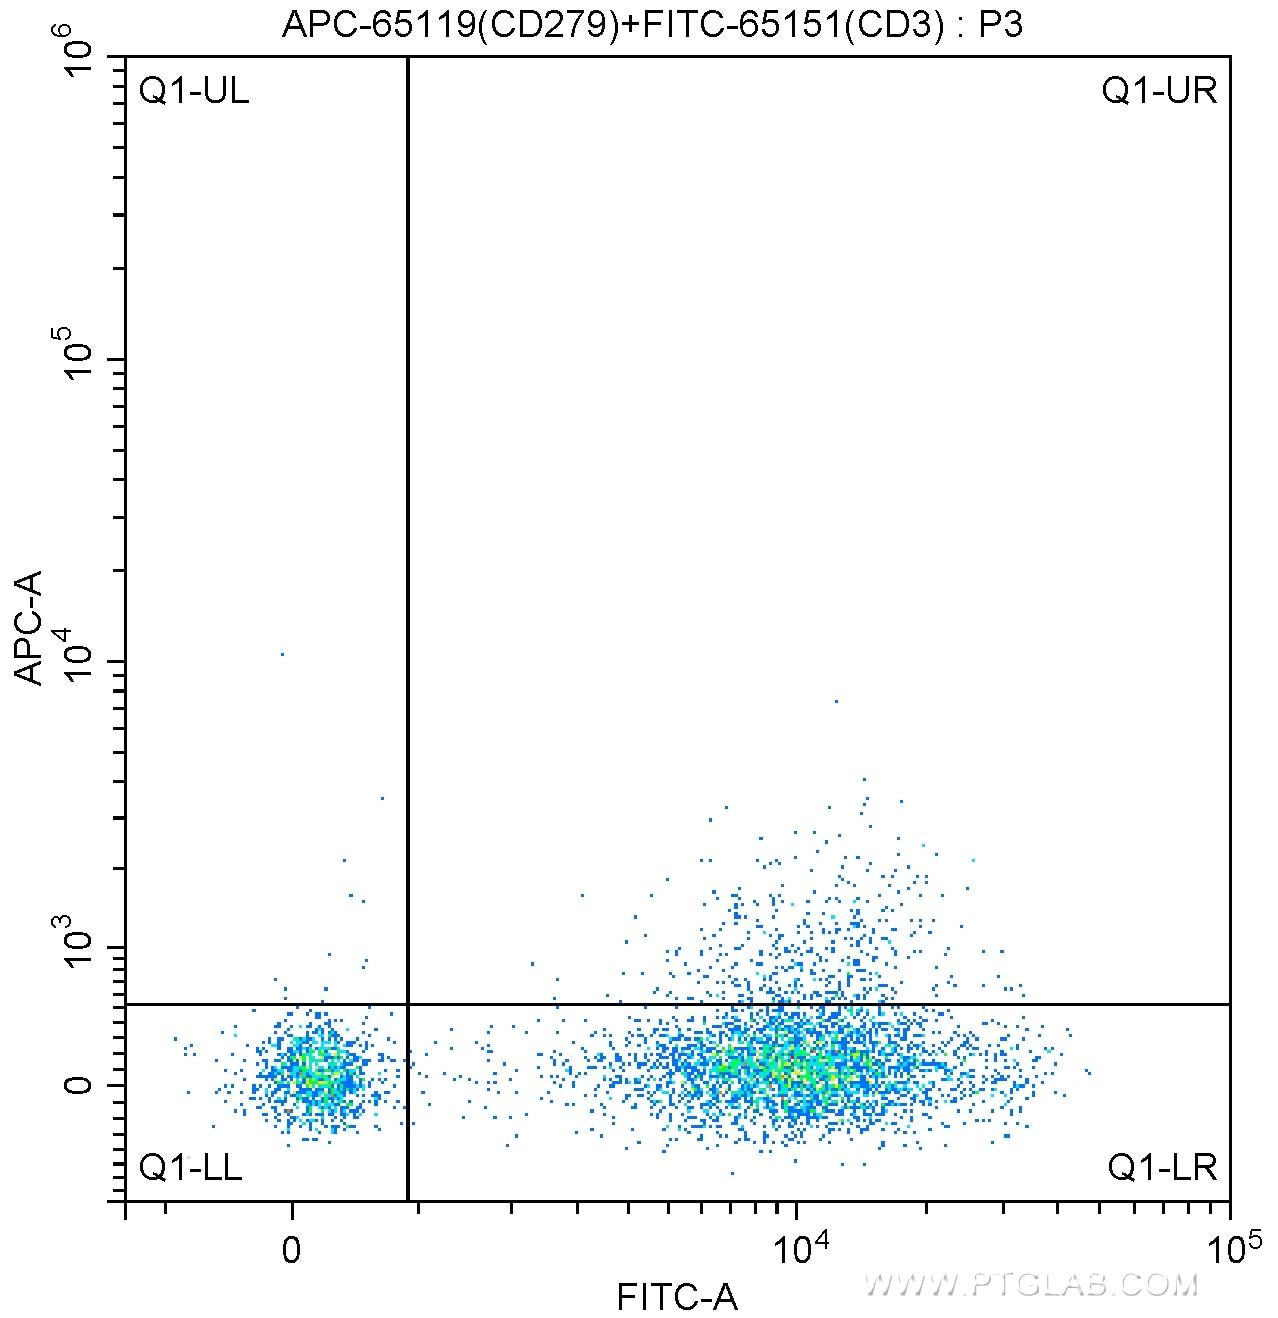 FC experiment of human peripheral blood lymphocytes using APC-65119